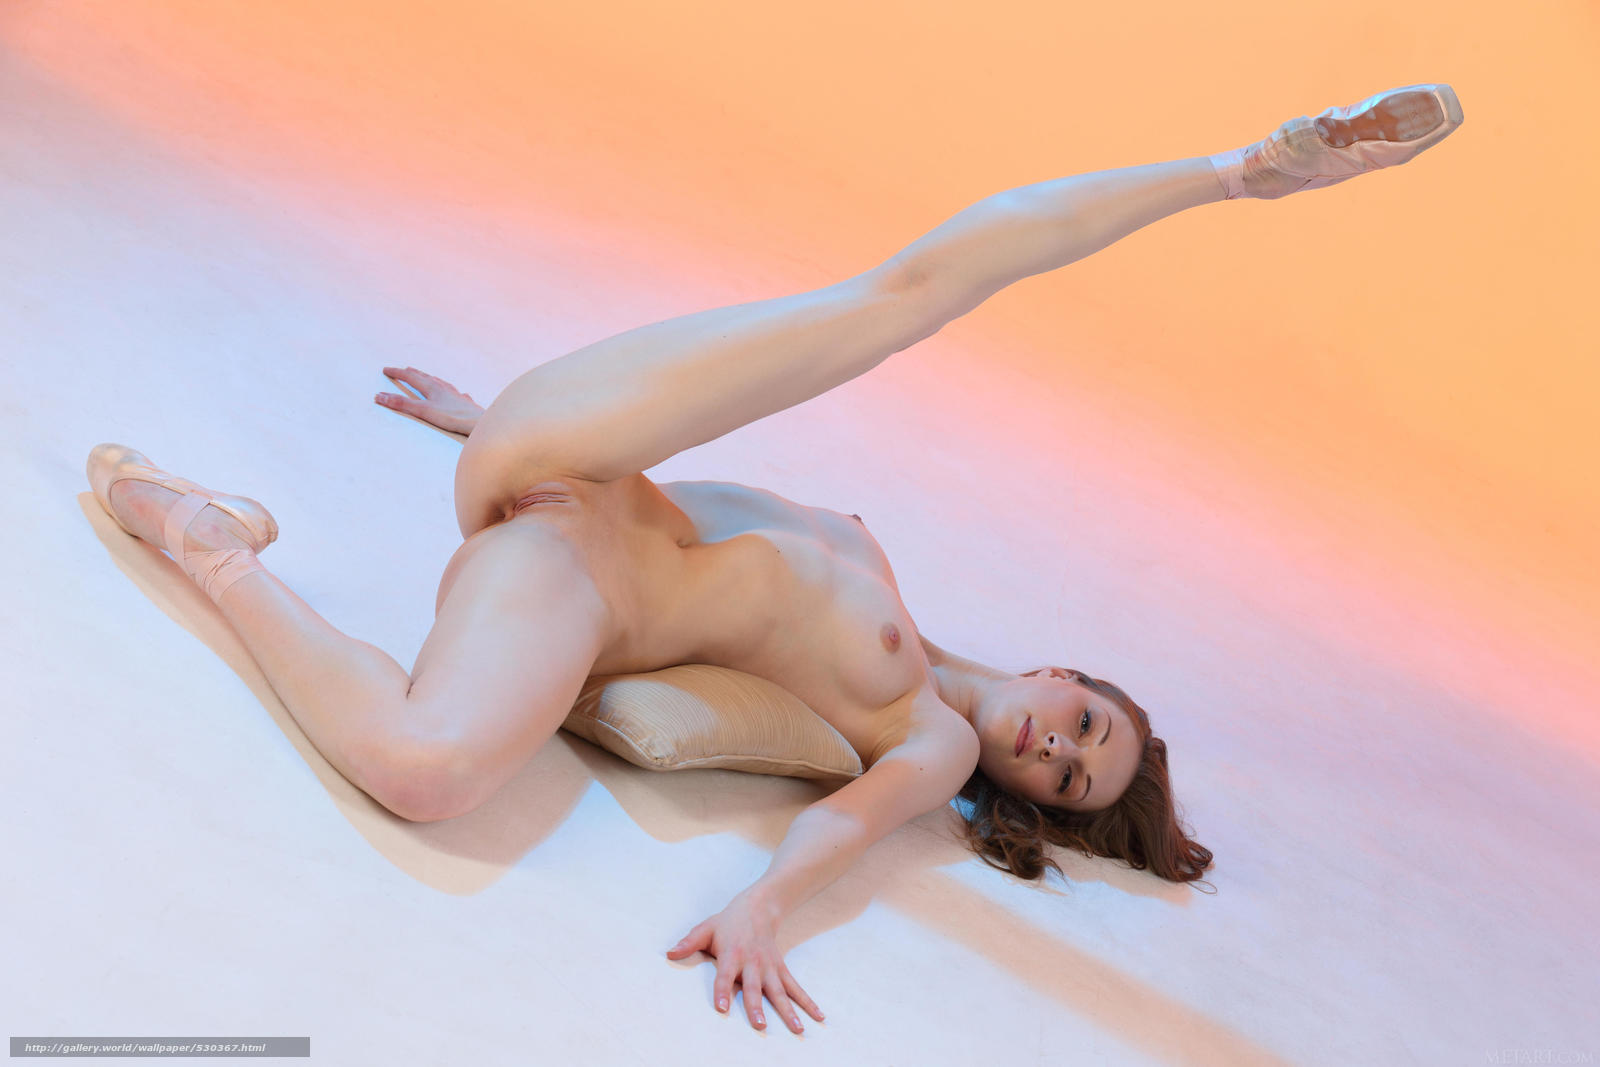 golaya-balerina-onlayn-video